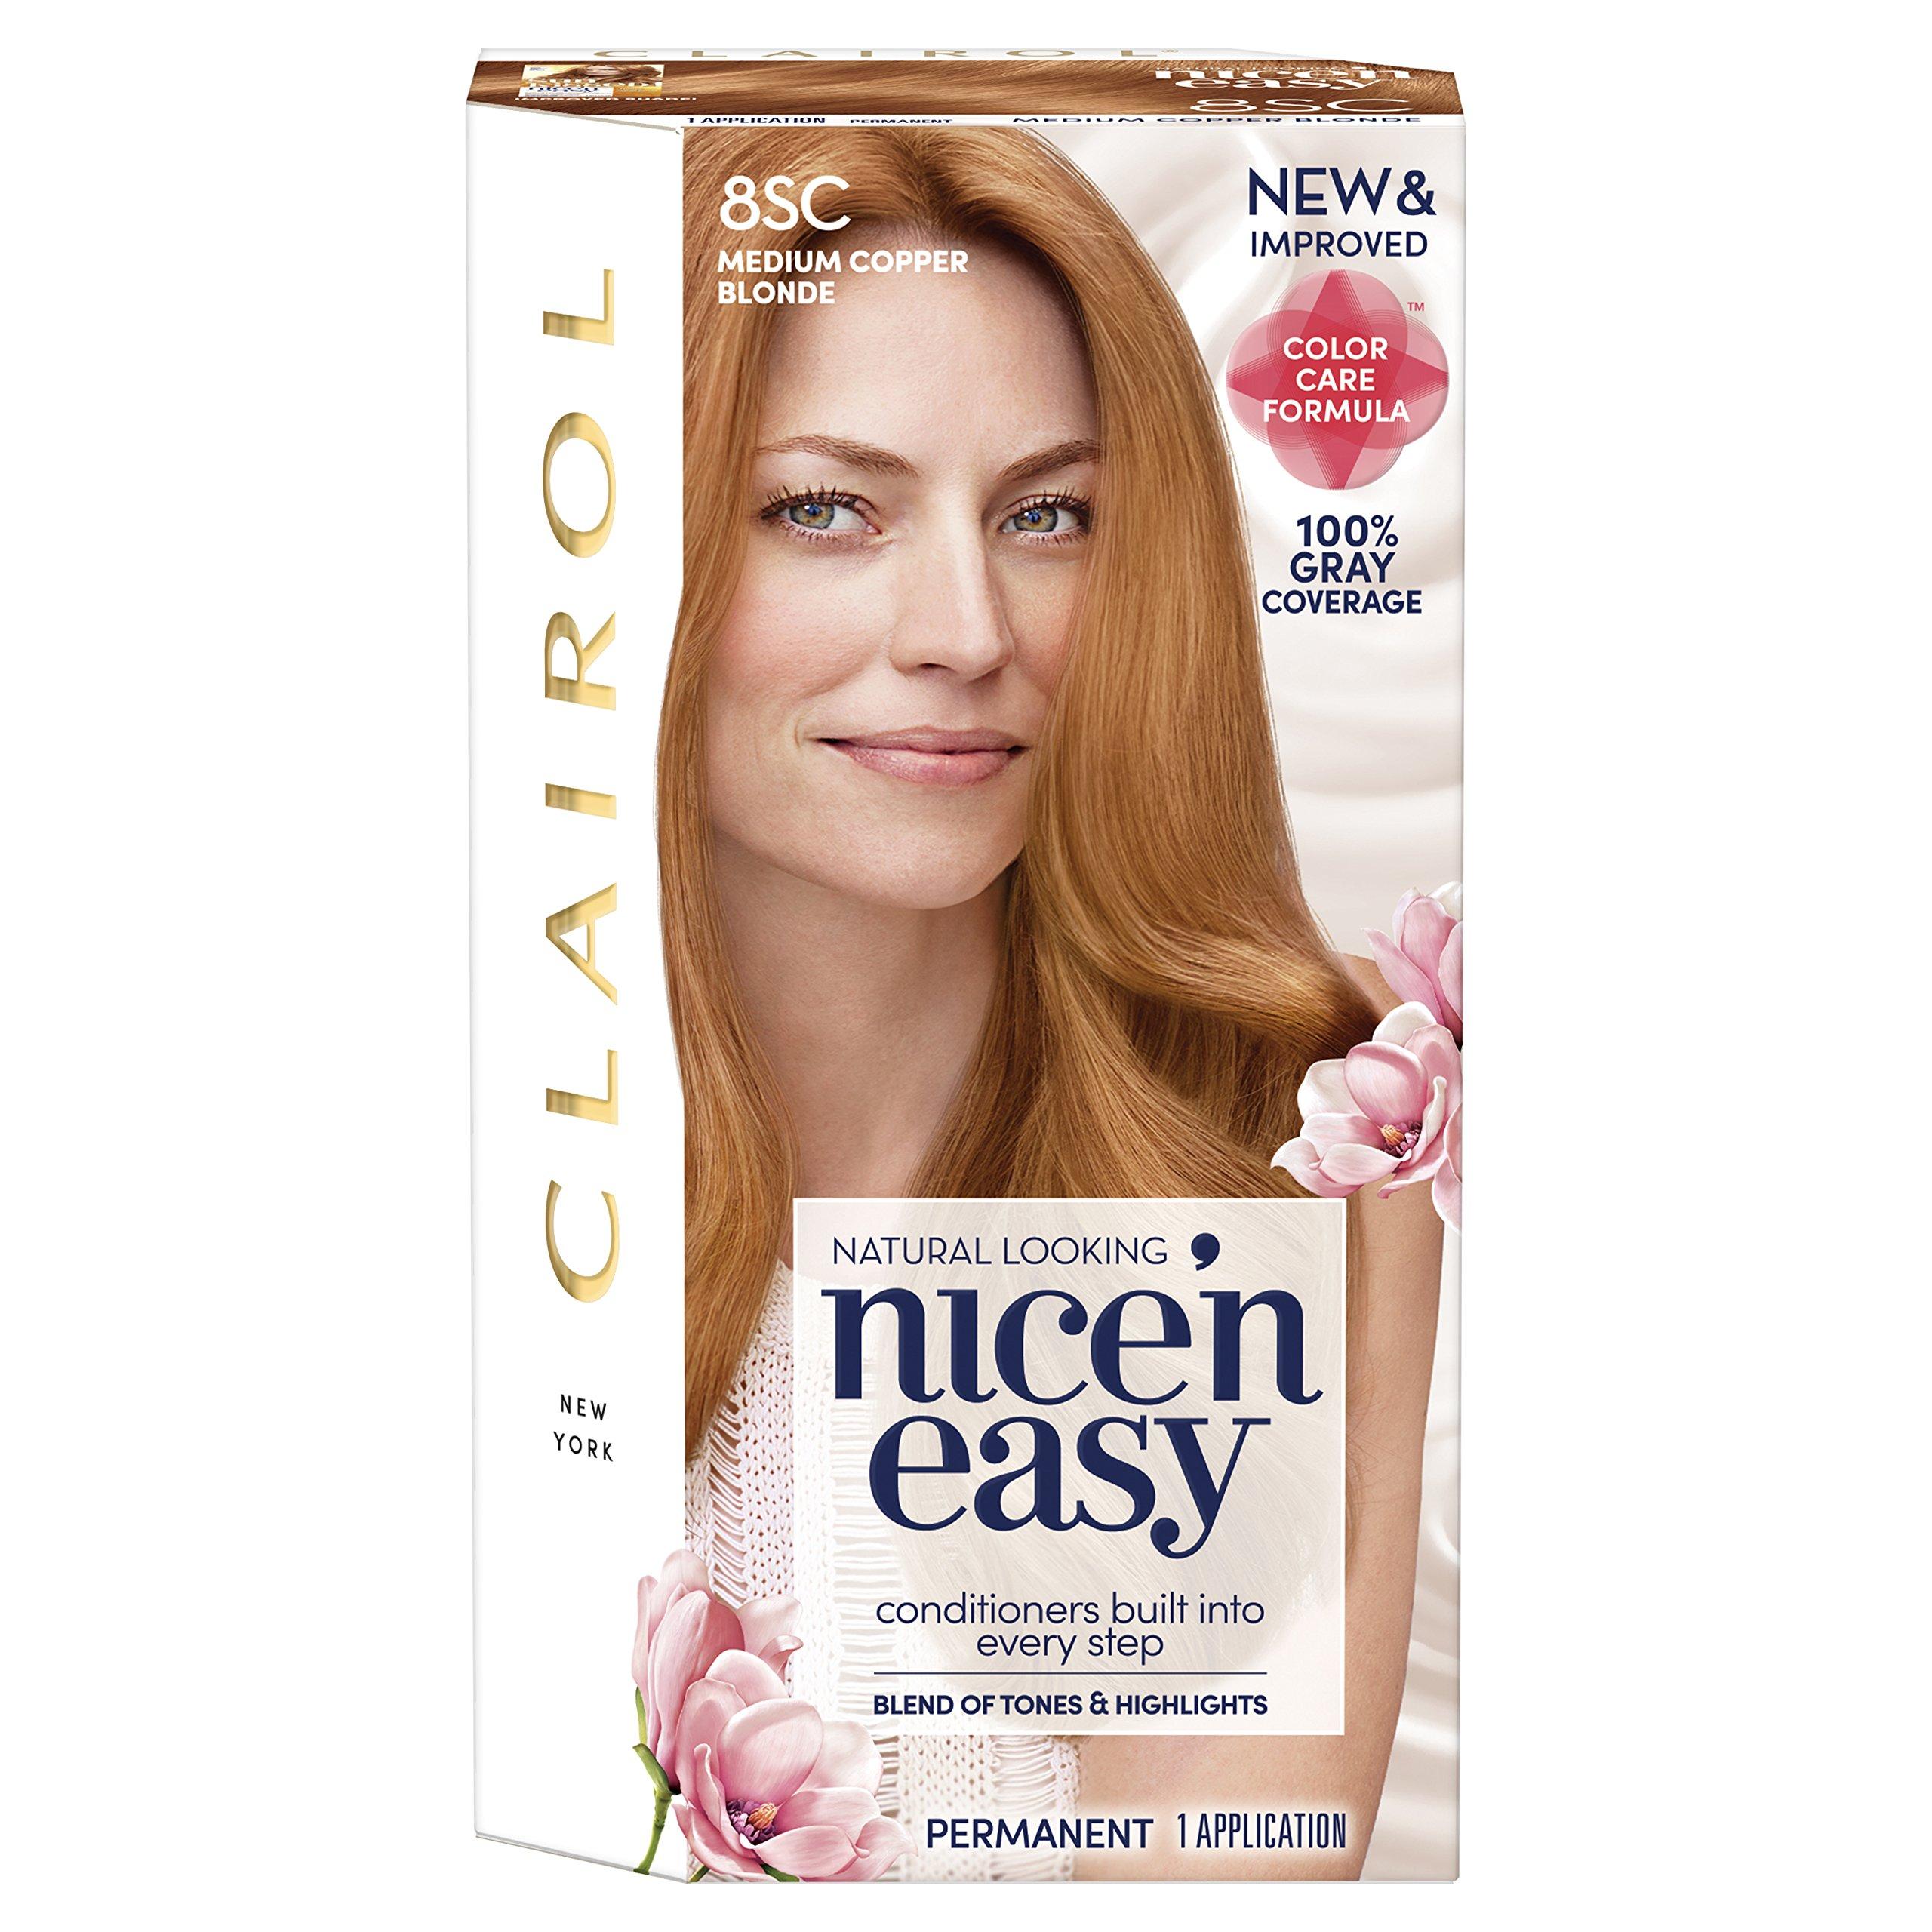 Amazon.com: Clairol Nice \u002639;n Easy, 8SC Medium Copper Blonde, Permanent Hair Color, 1 Kit